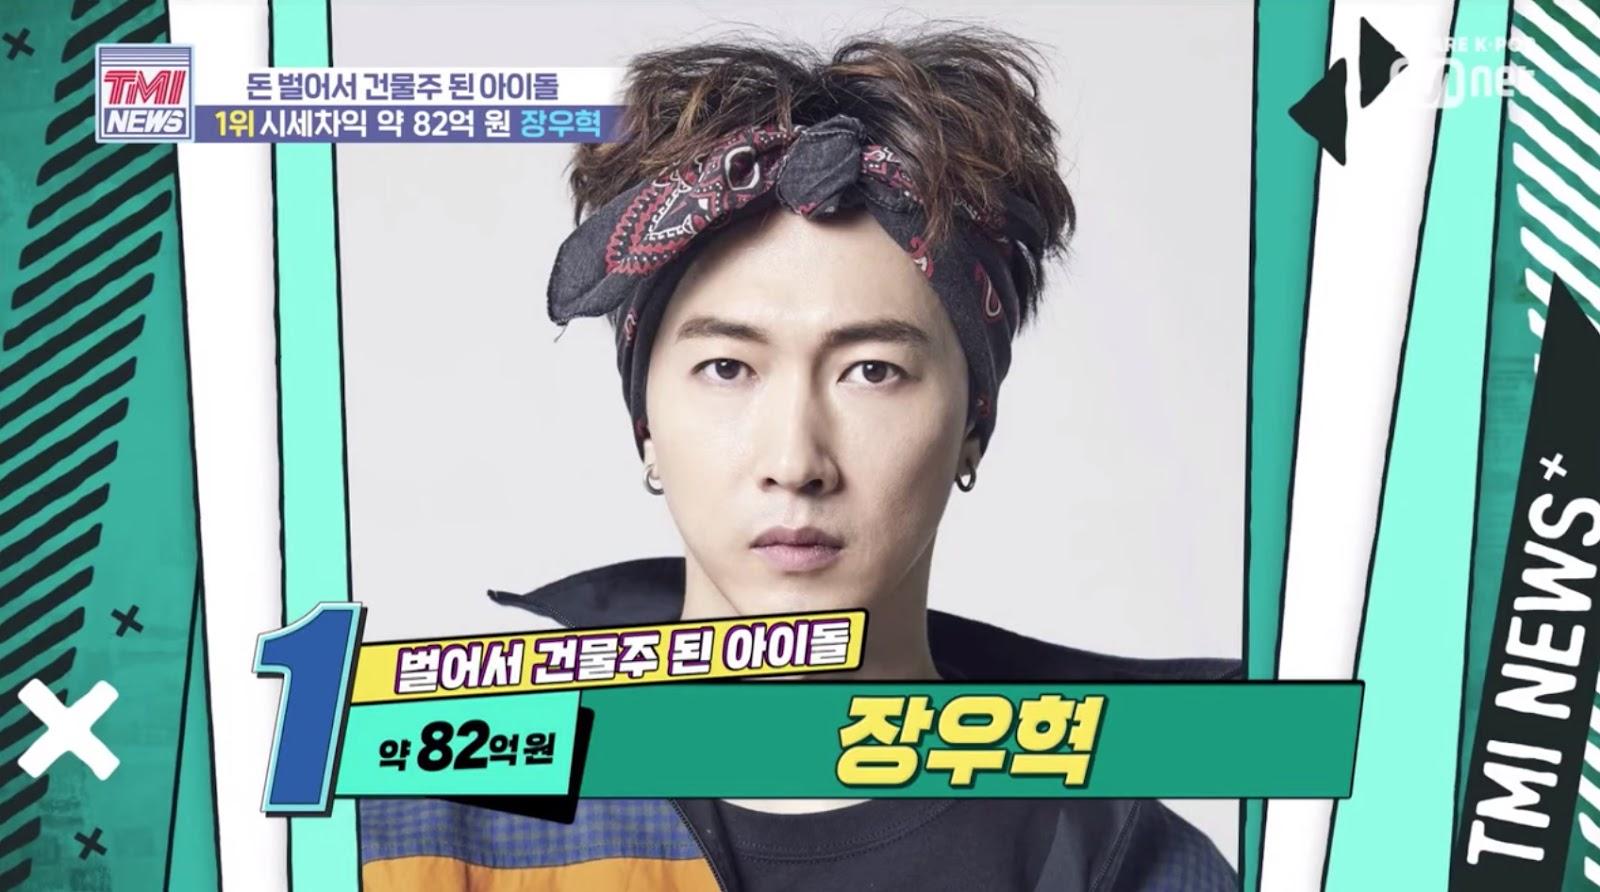 kpop real estate rich idol 4